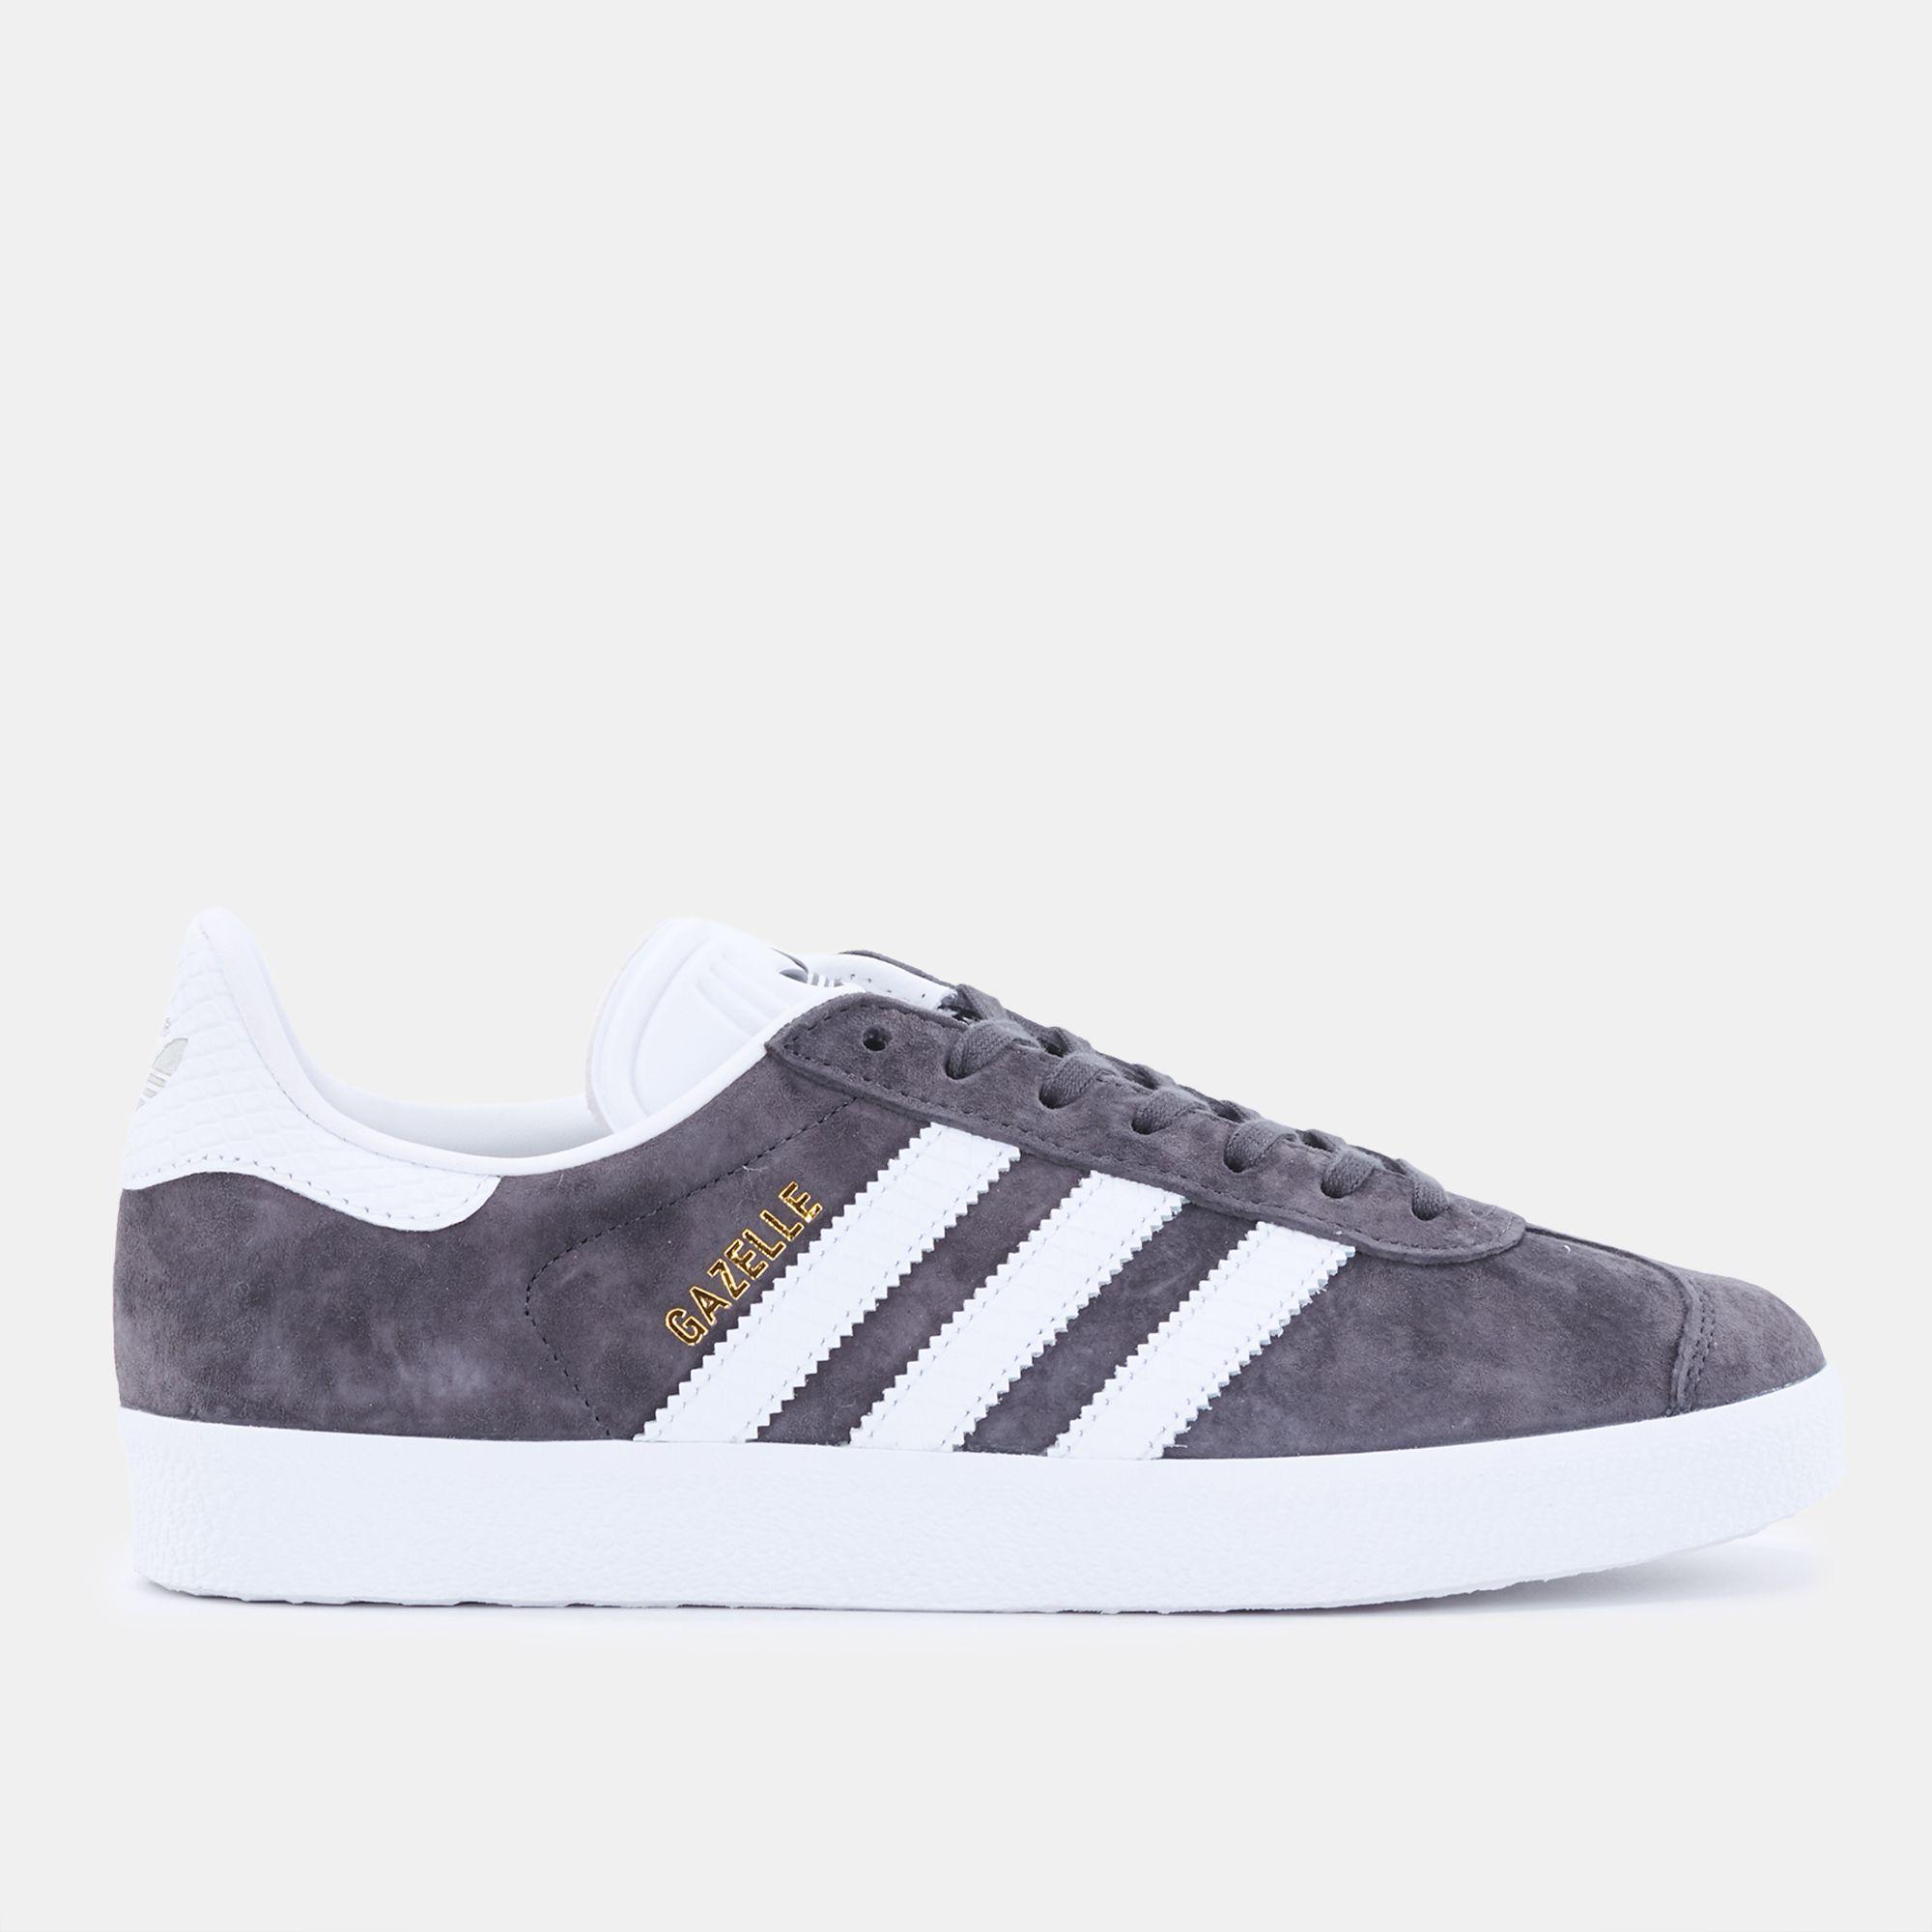 Adidas Basketball Shoes Price In Saudi Arabia